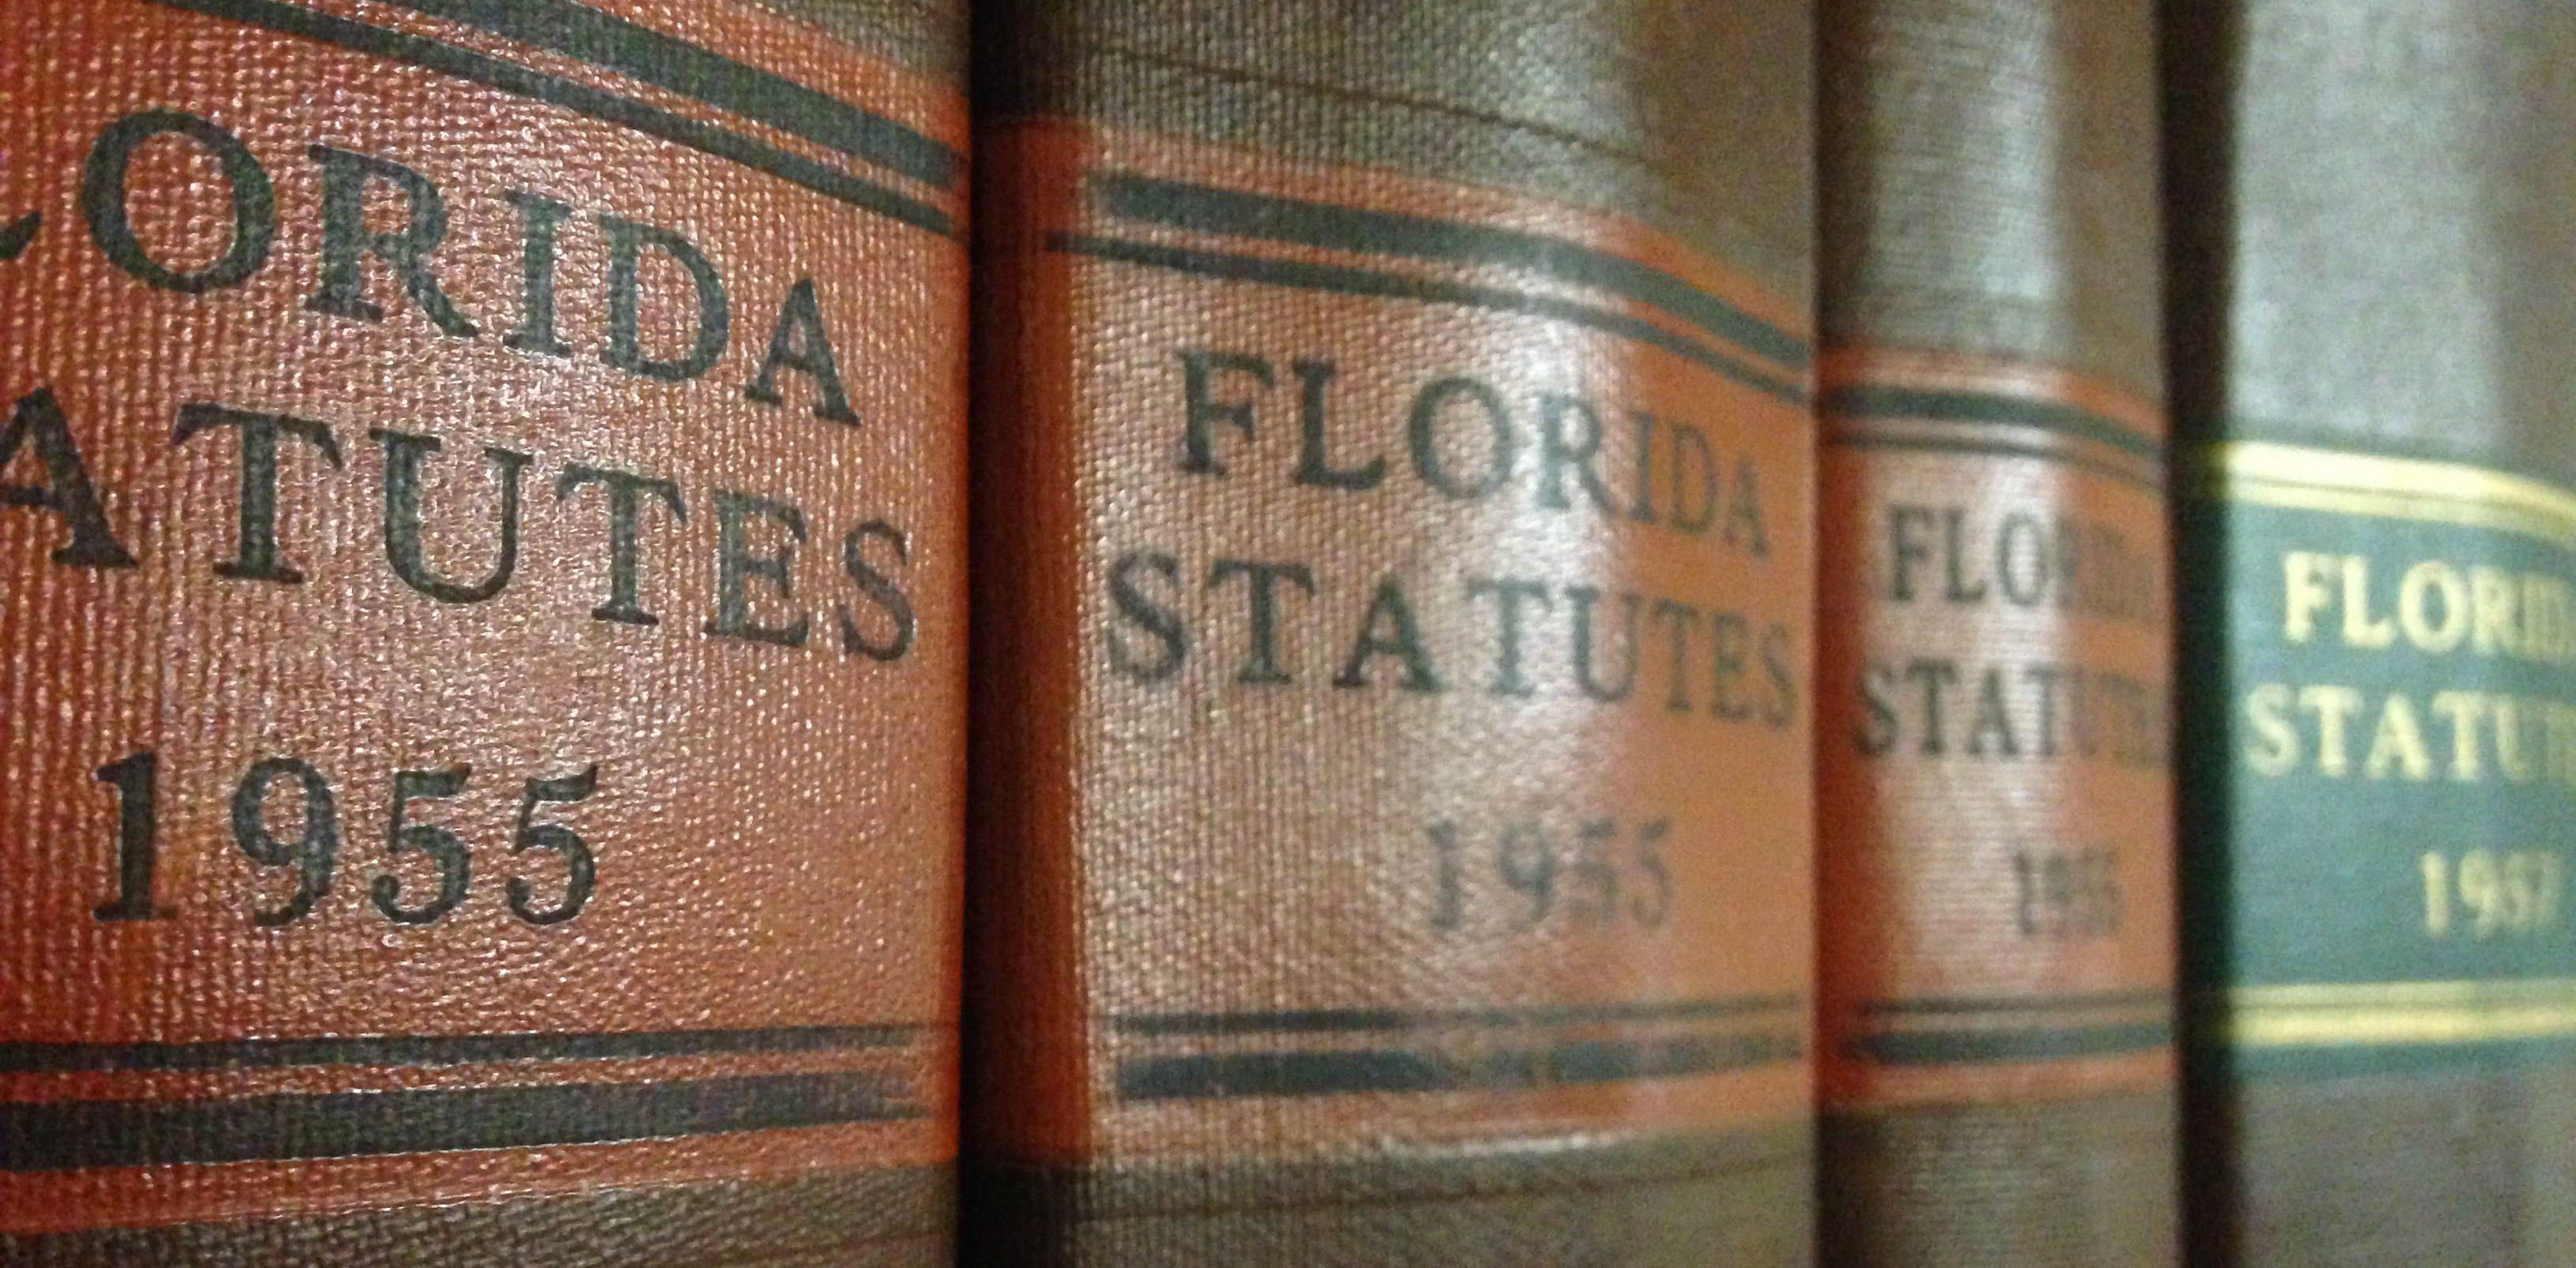 florida statutes books